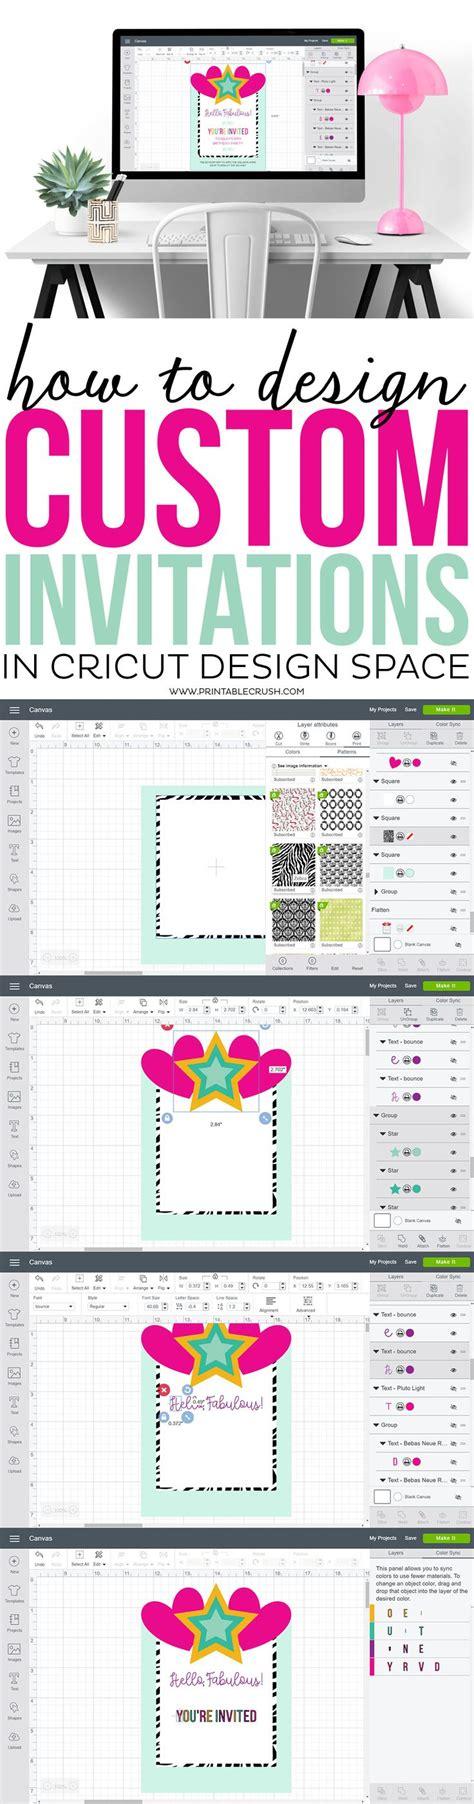 design invitation from scratch best 25 cricut invitations ideas on pinterest cricut